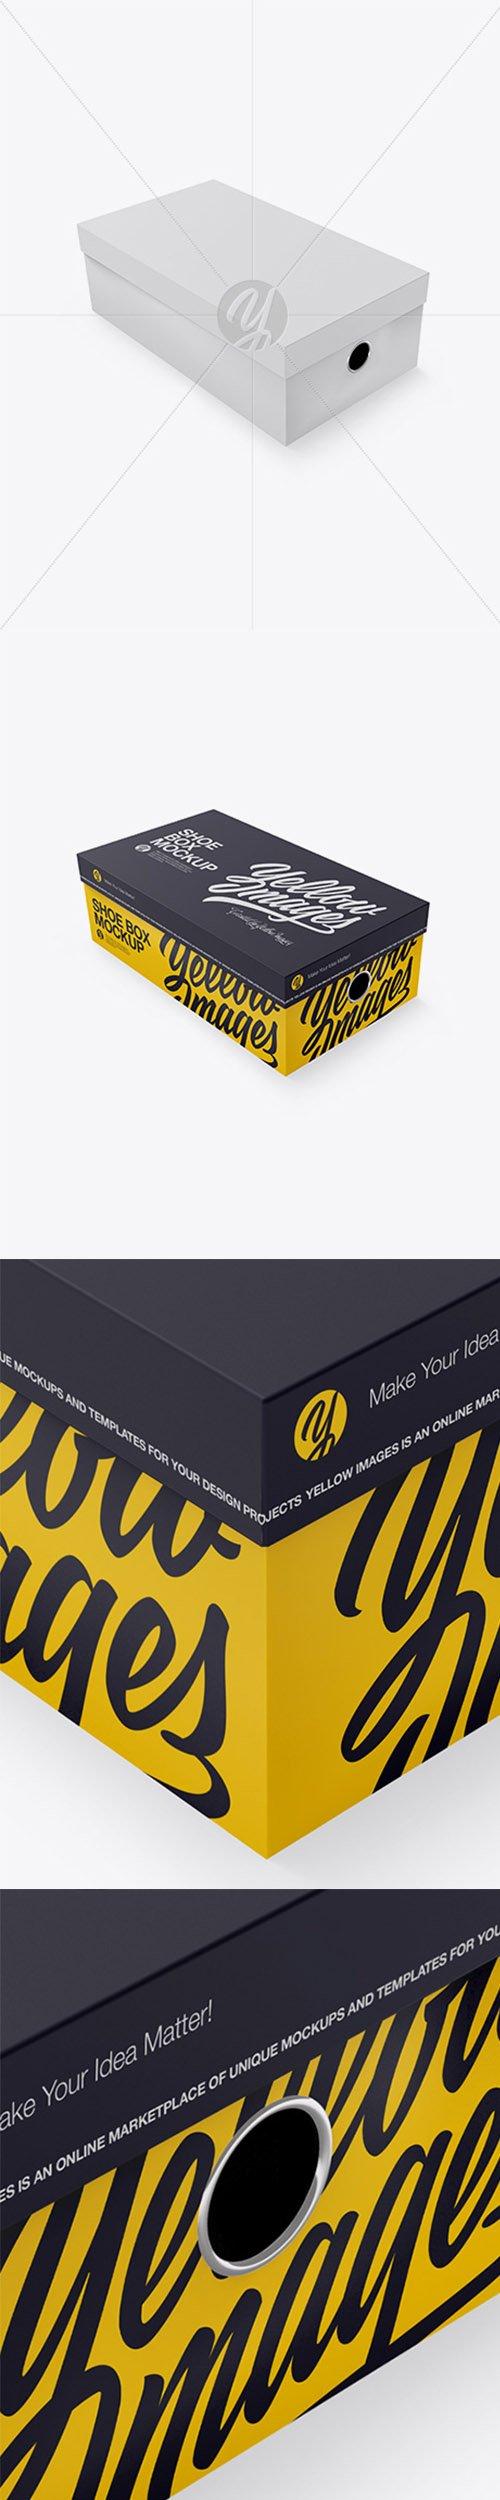 Shoes Box Mockup - Half Side View (High Angle) 19901 TIF